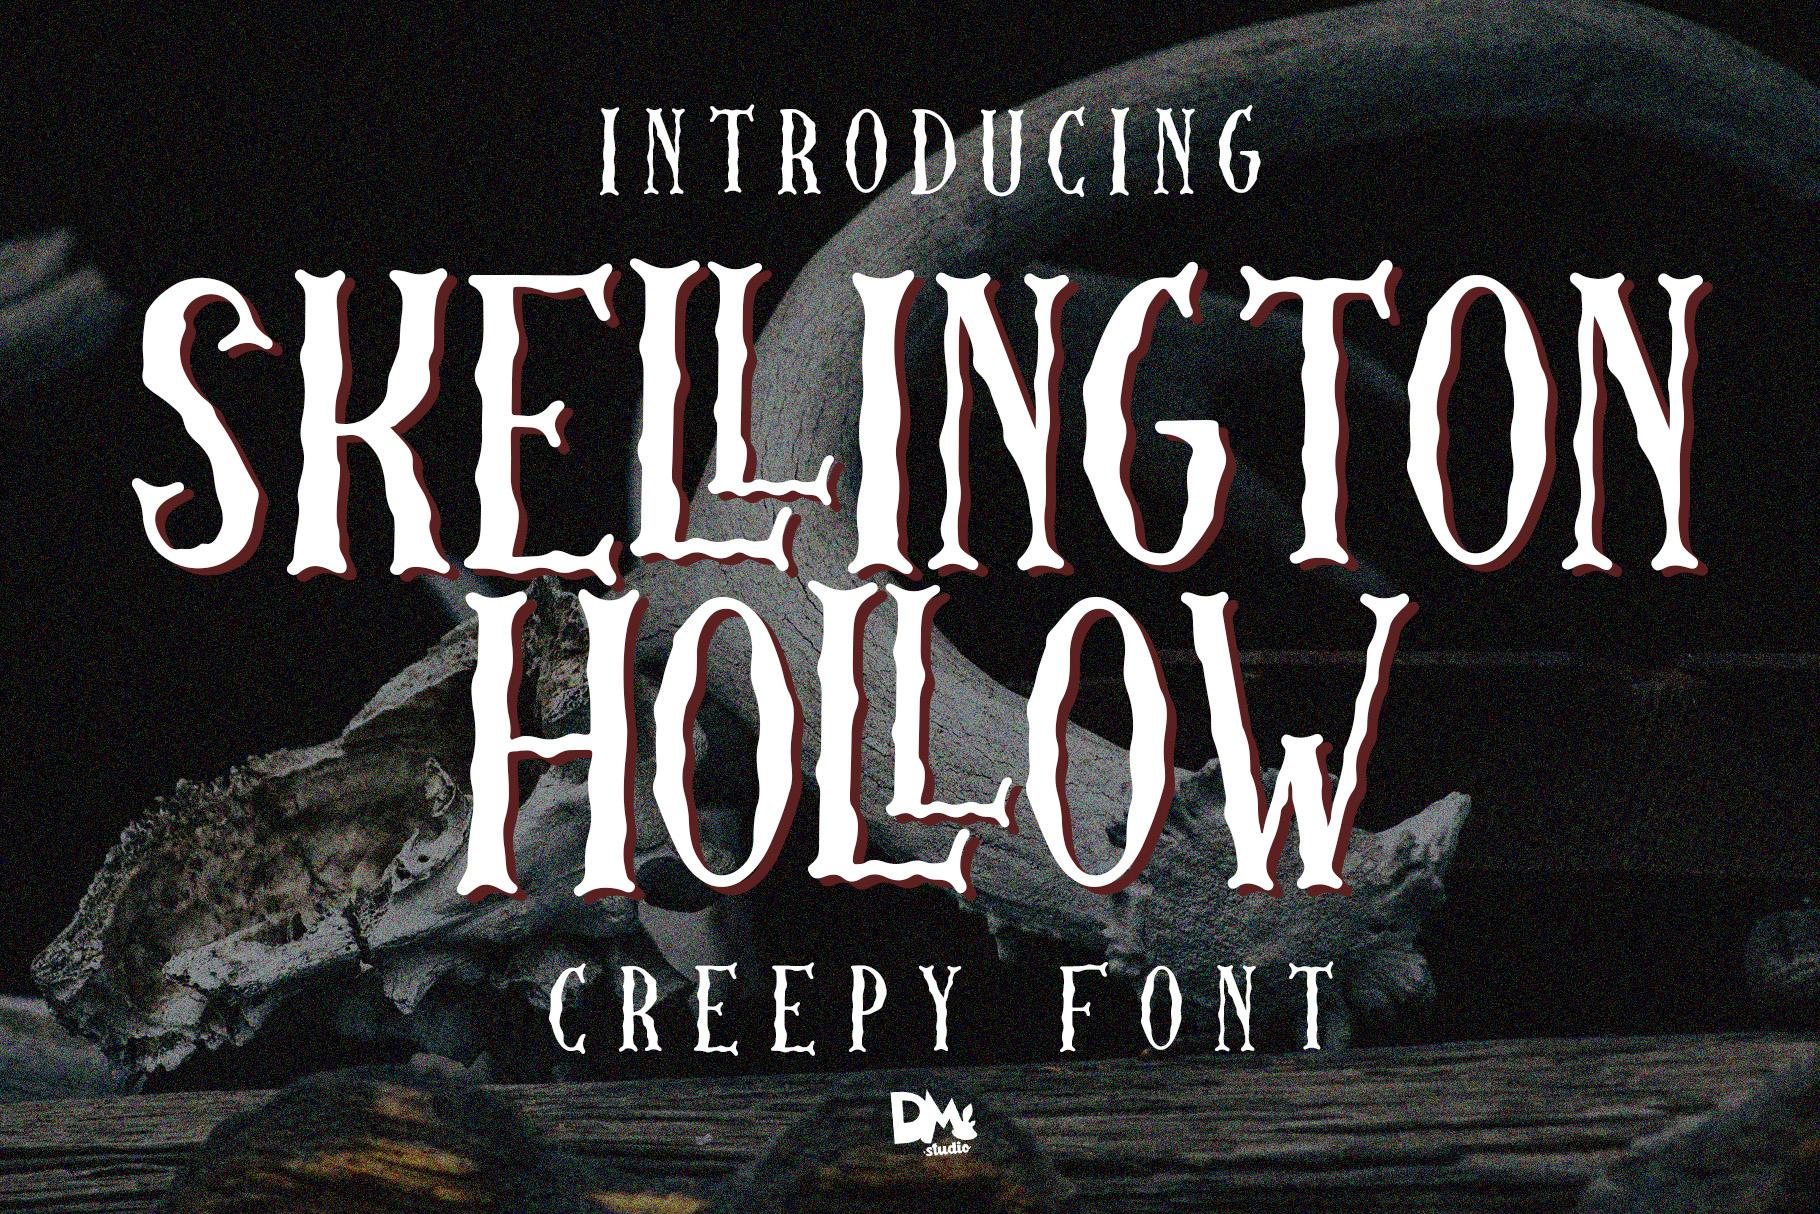 Skellington Hollow - Creepy Font example image 1